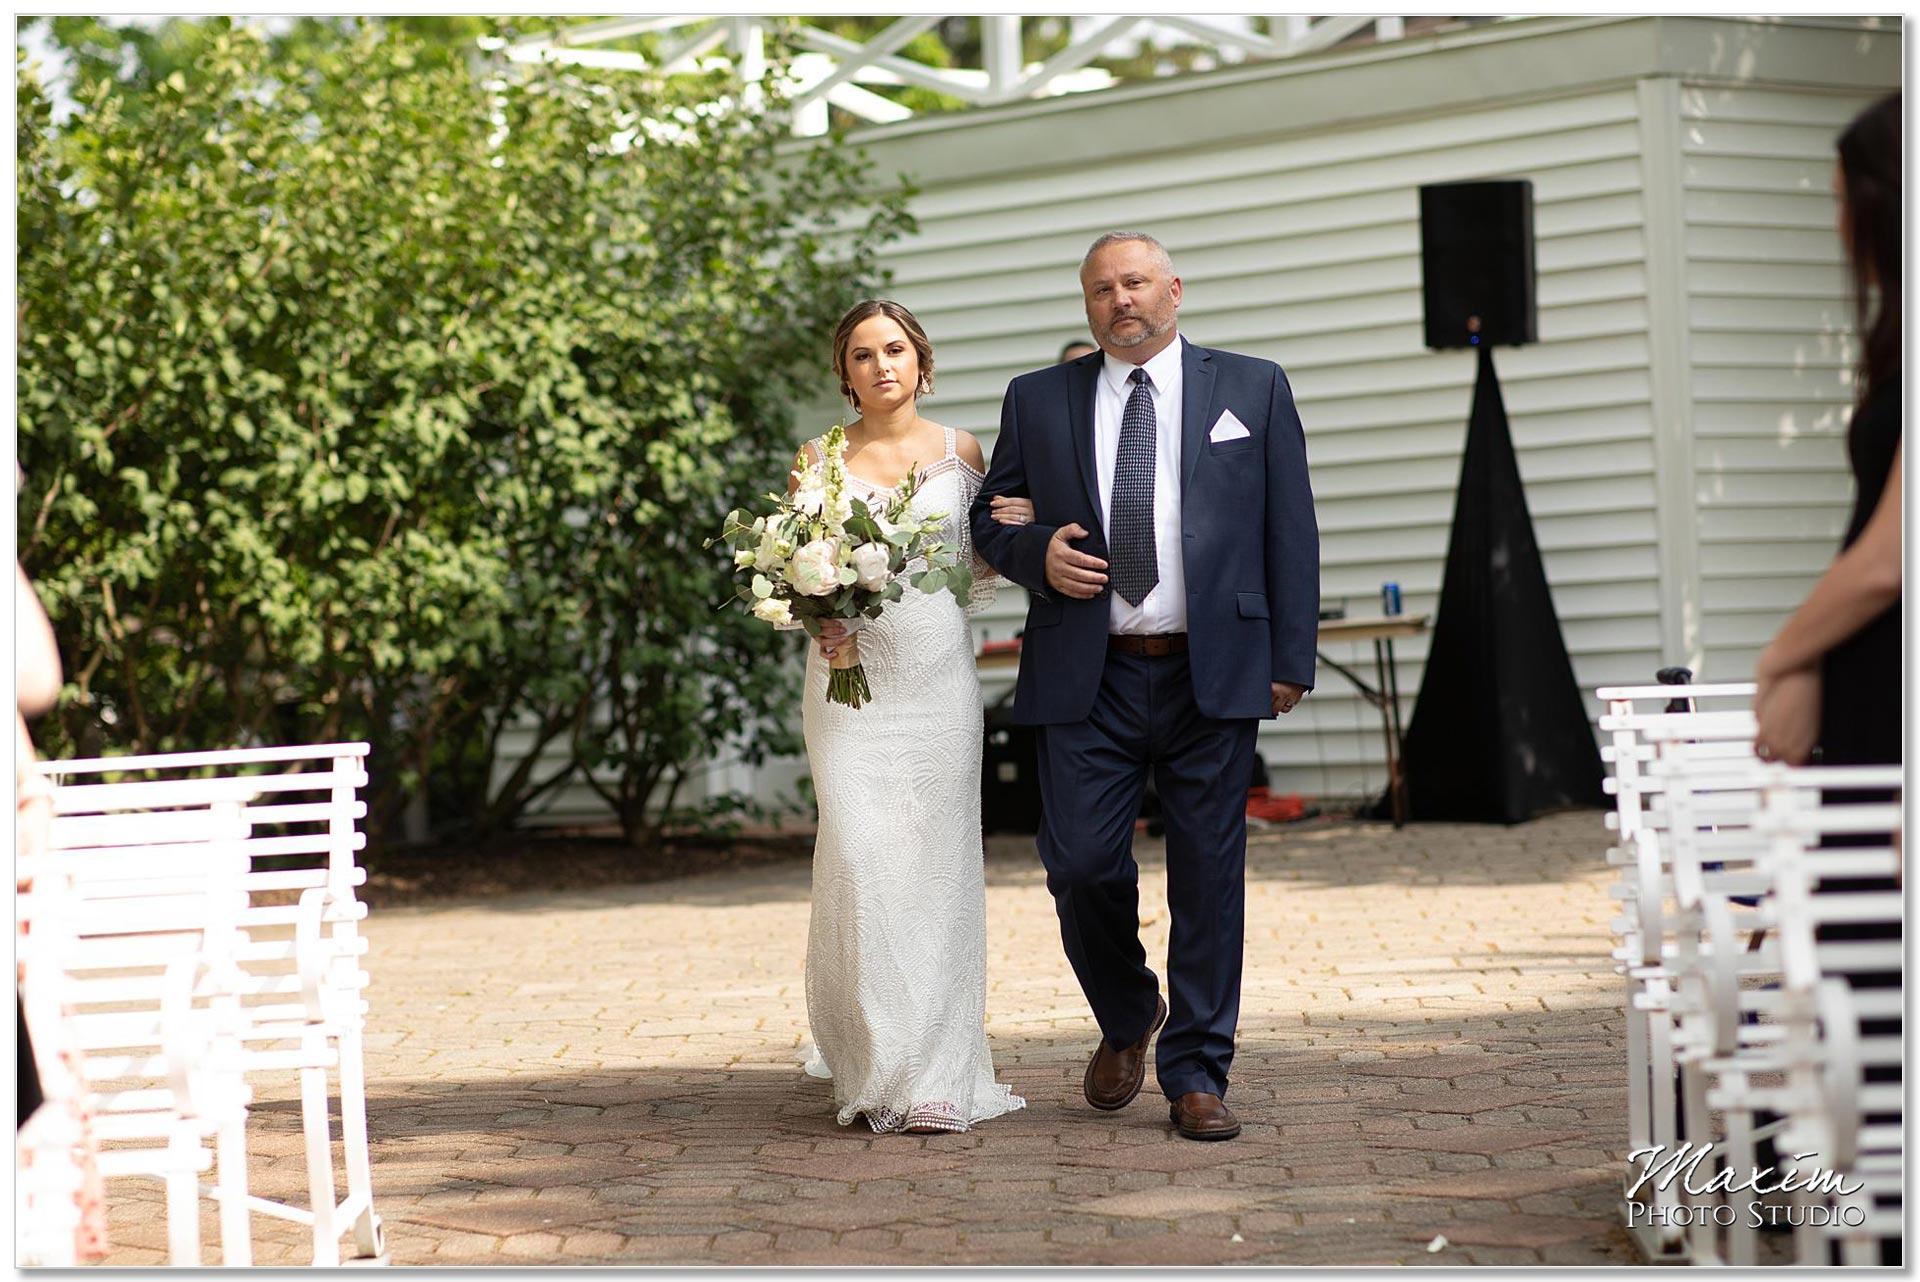 Polen Farm Wedding ceremony entrance